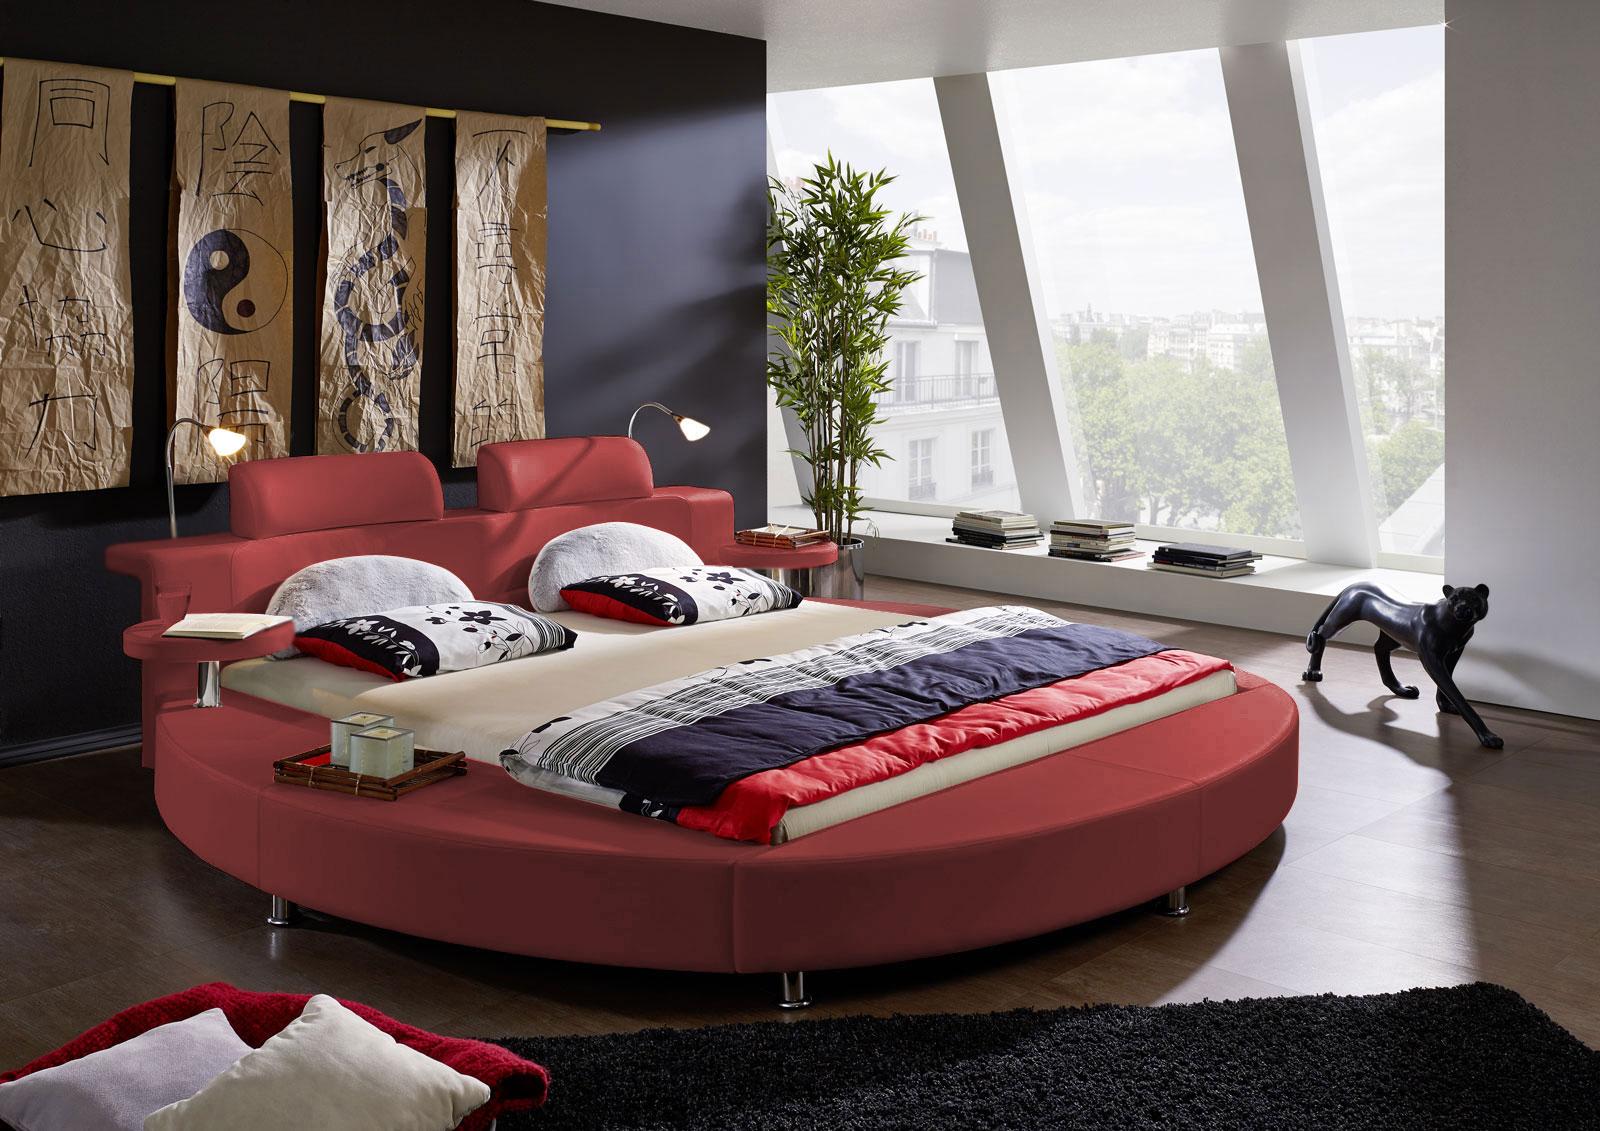 sam rundbett doppelbett 180 x 200 cm 2 lampen rot classico. Black Bedroom Furniture Sets. Home Design Ideas